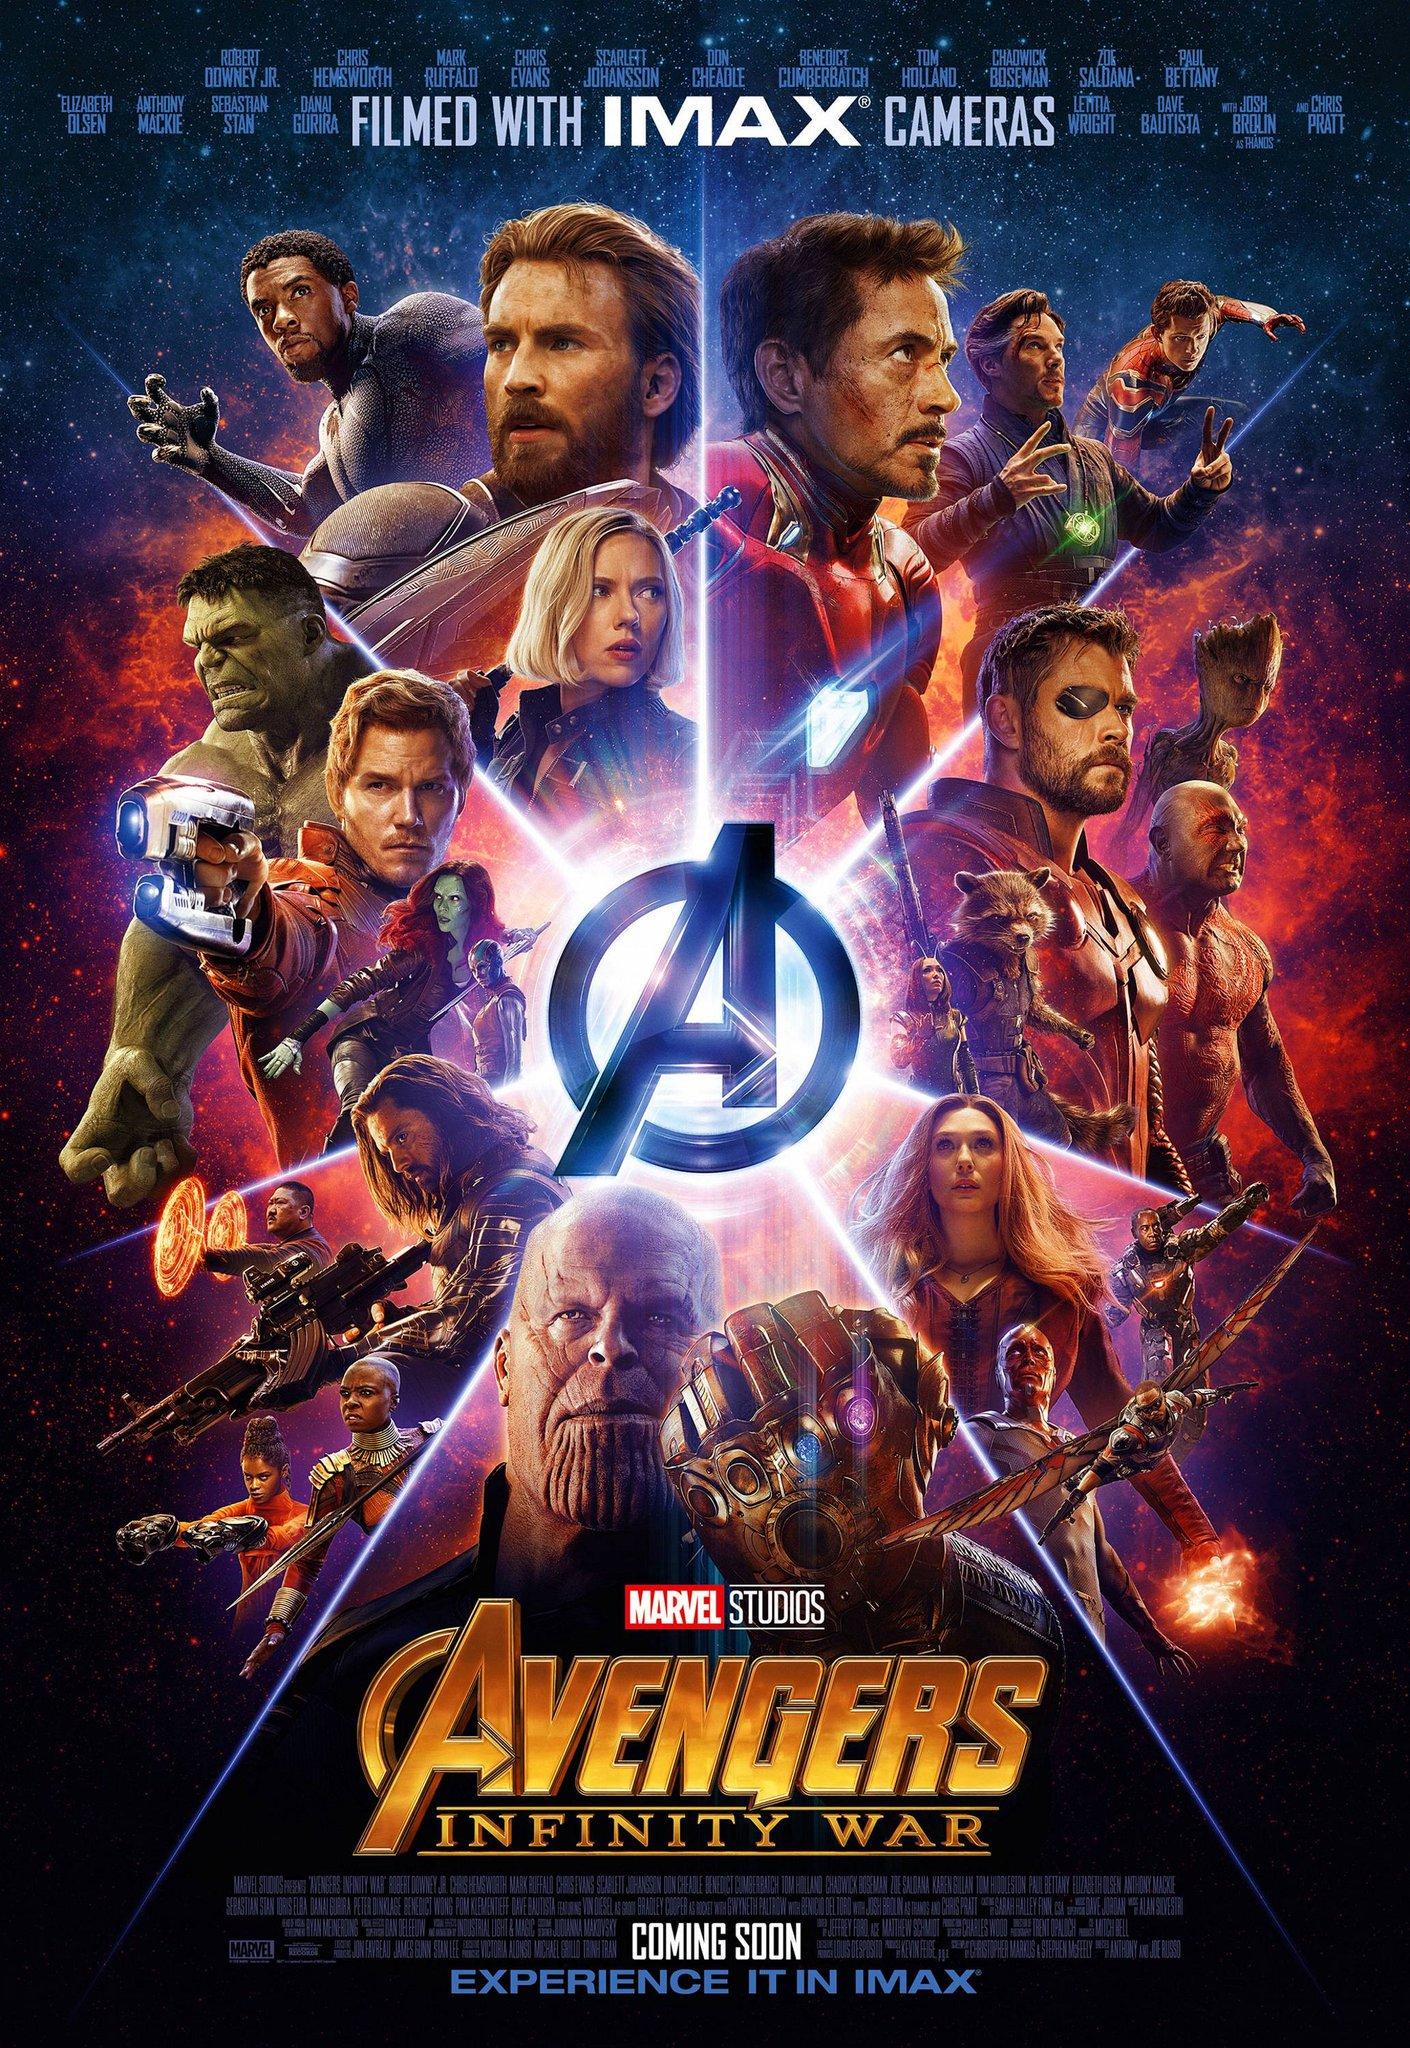 [Lo que se viene] Avengers: Infinity War - Página 4 DaBavlpWAAs3aFX